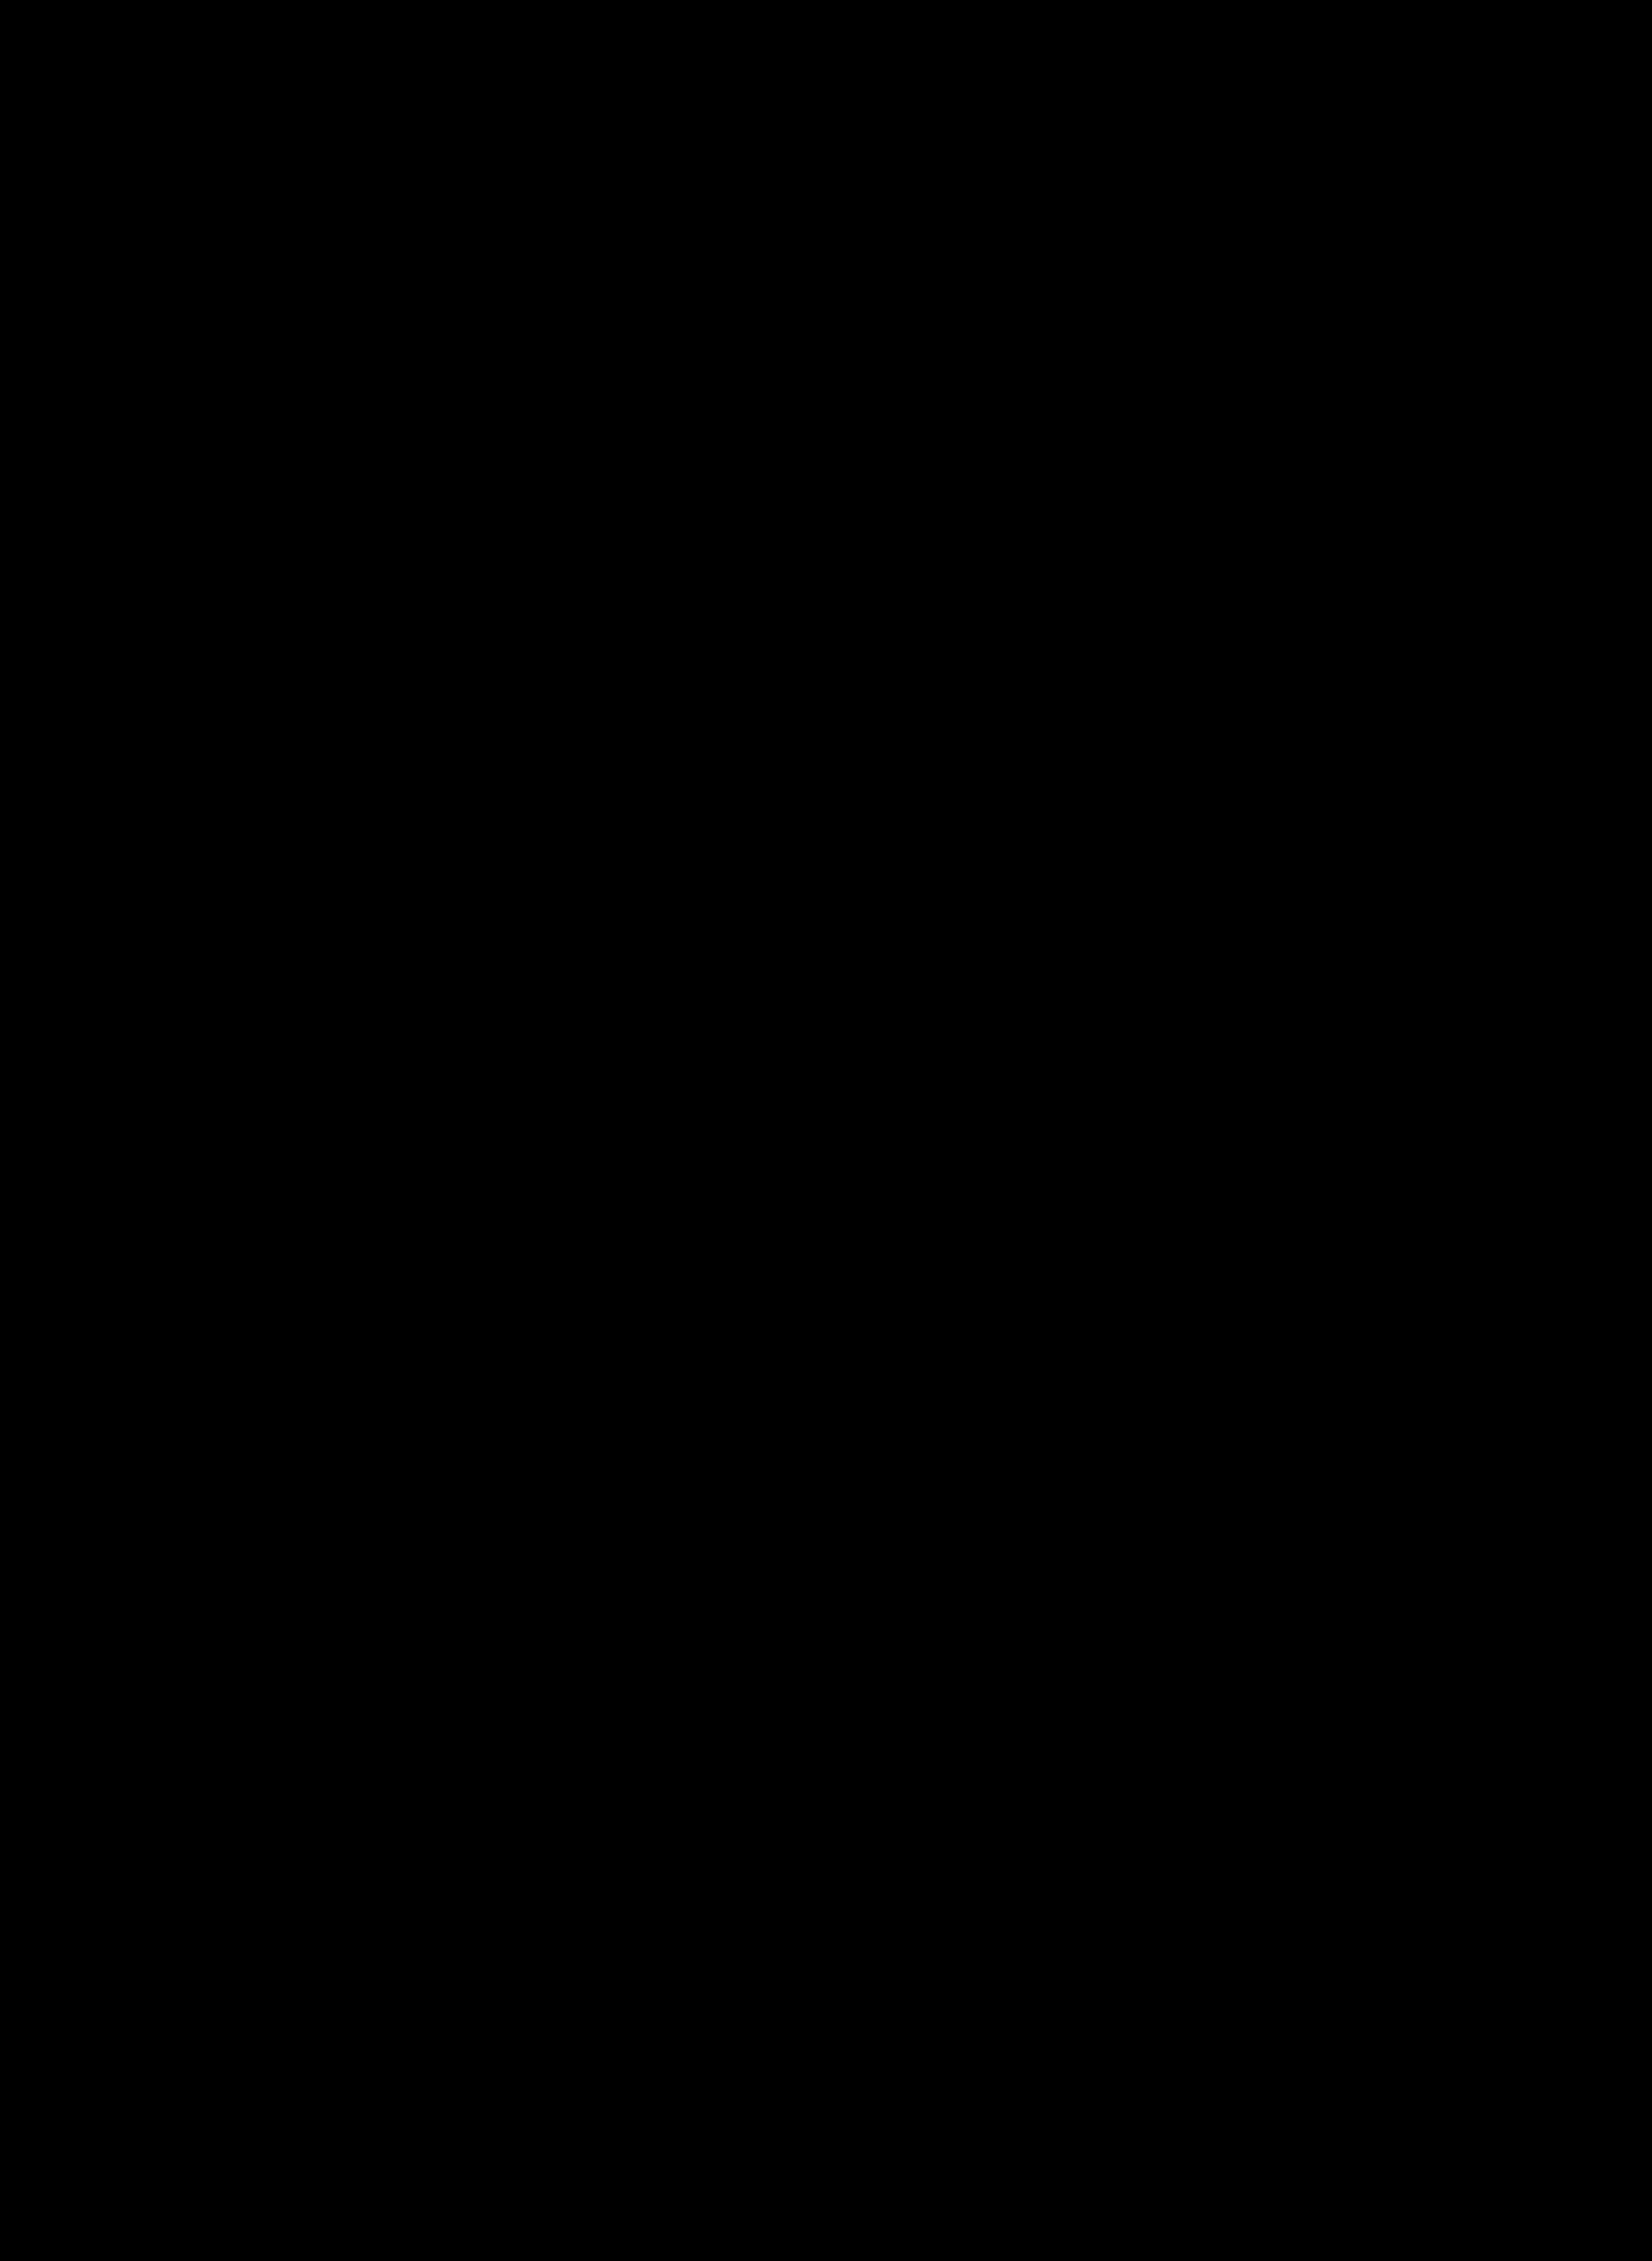 2000x2737 Filefiddler Silhouette.svg